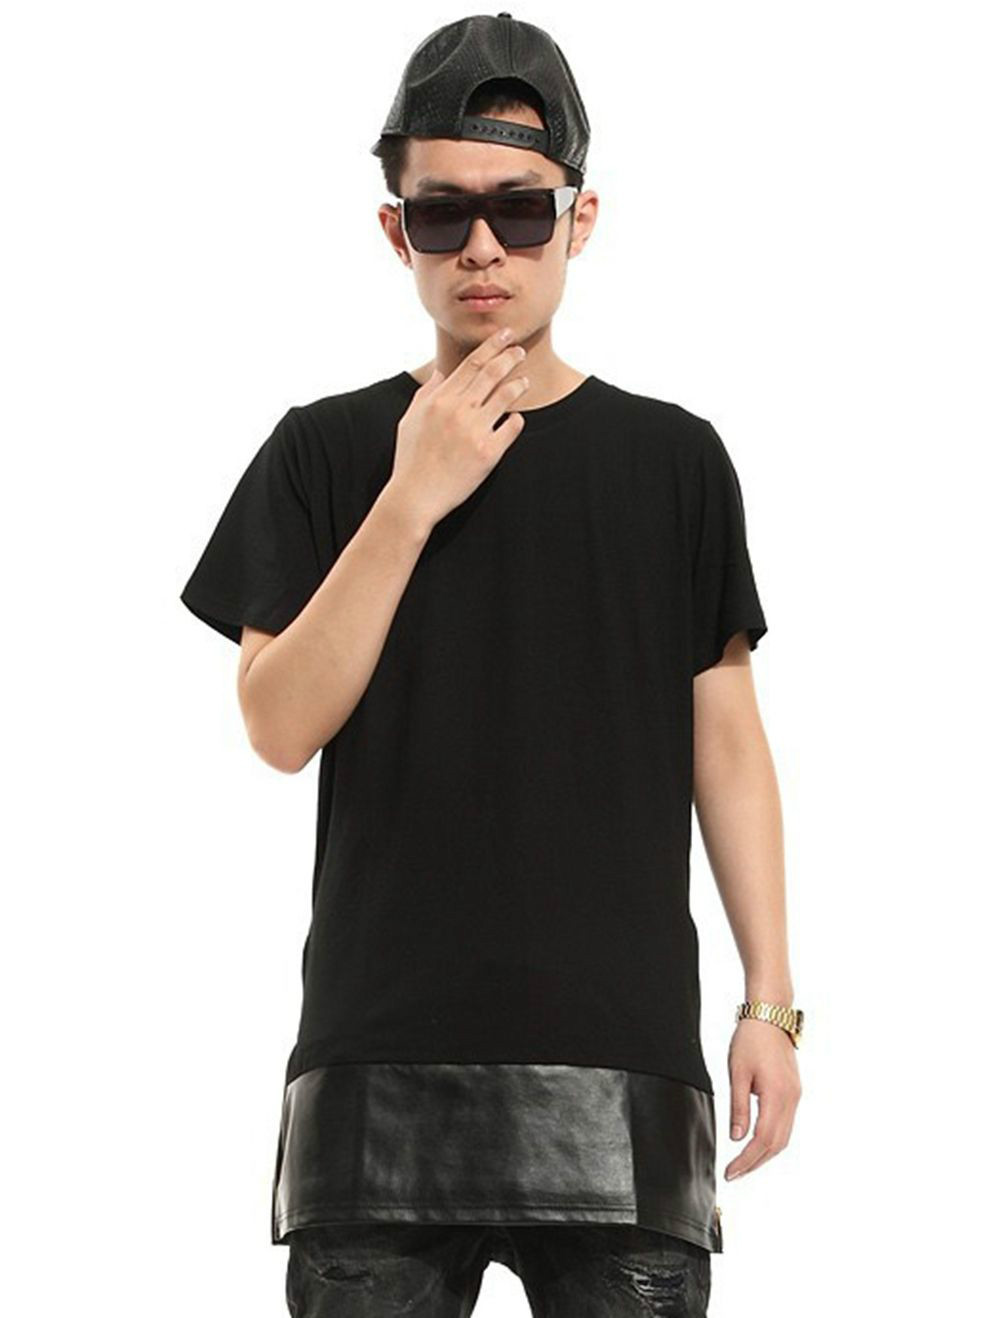 mens t shirts fashion 2015 gold blaze zipper lengthen